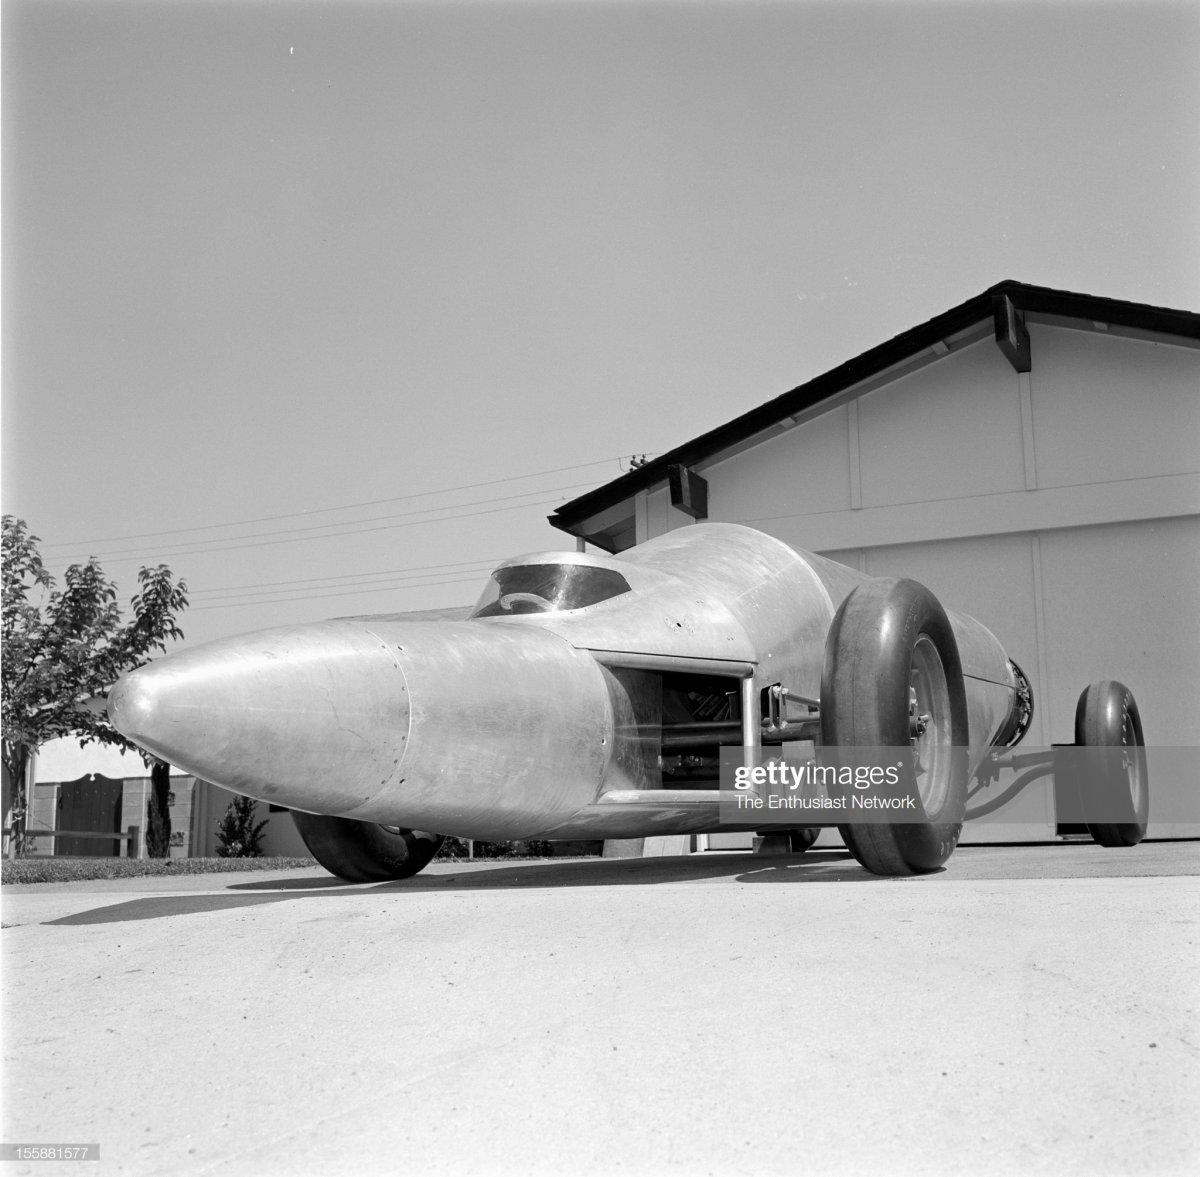 74 Bill Fredrick Valkyrie Jet Car3.jpg